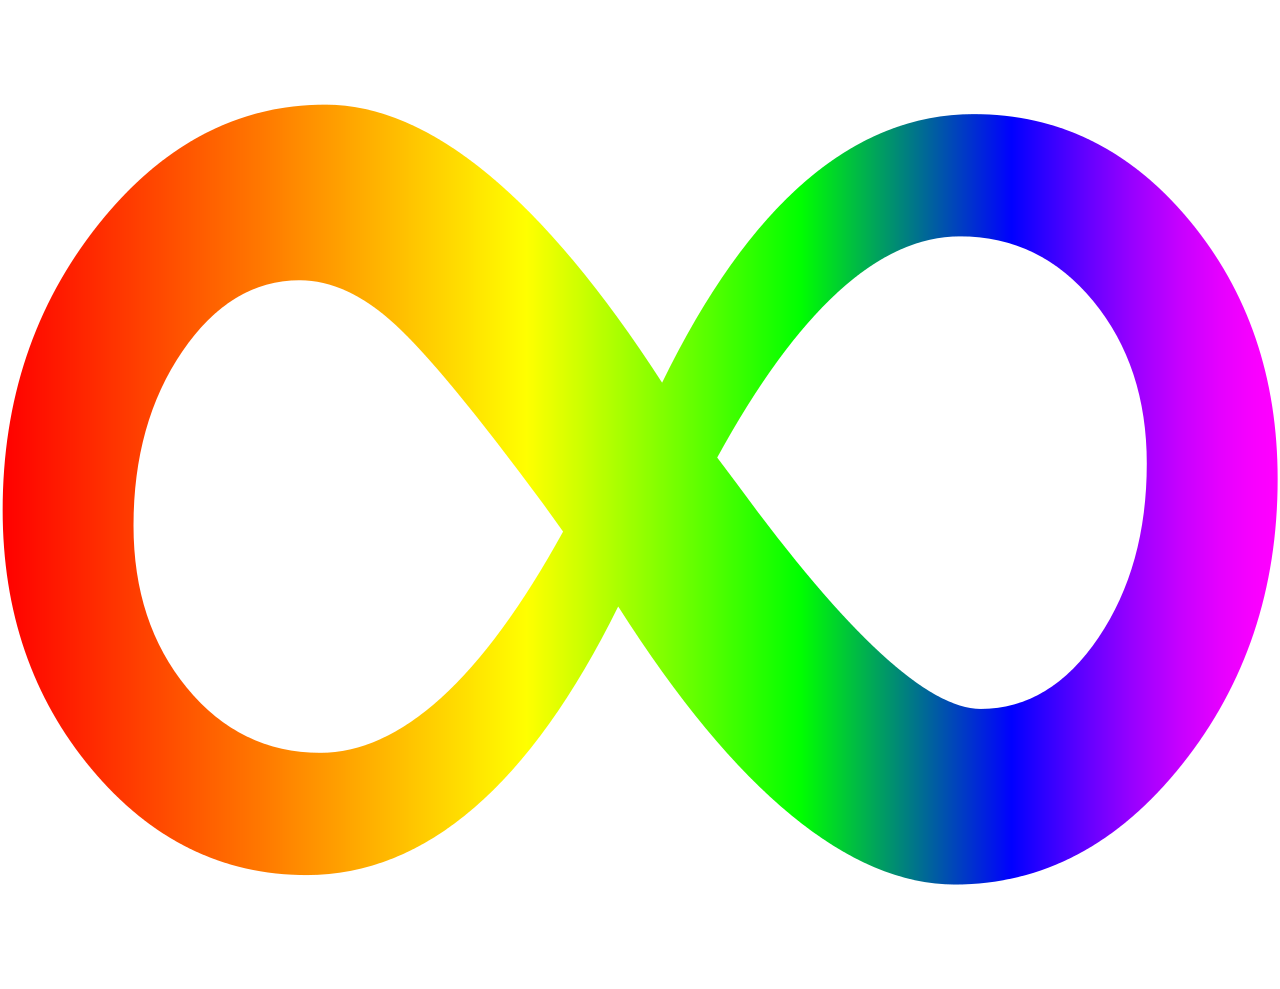 1280x989 Fileautism Spectrum Infinity Awareness Symbol.svg